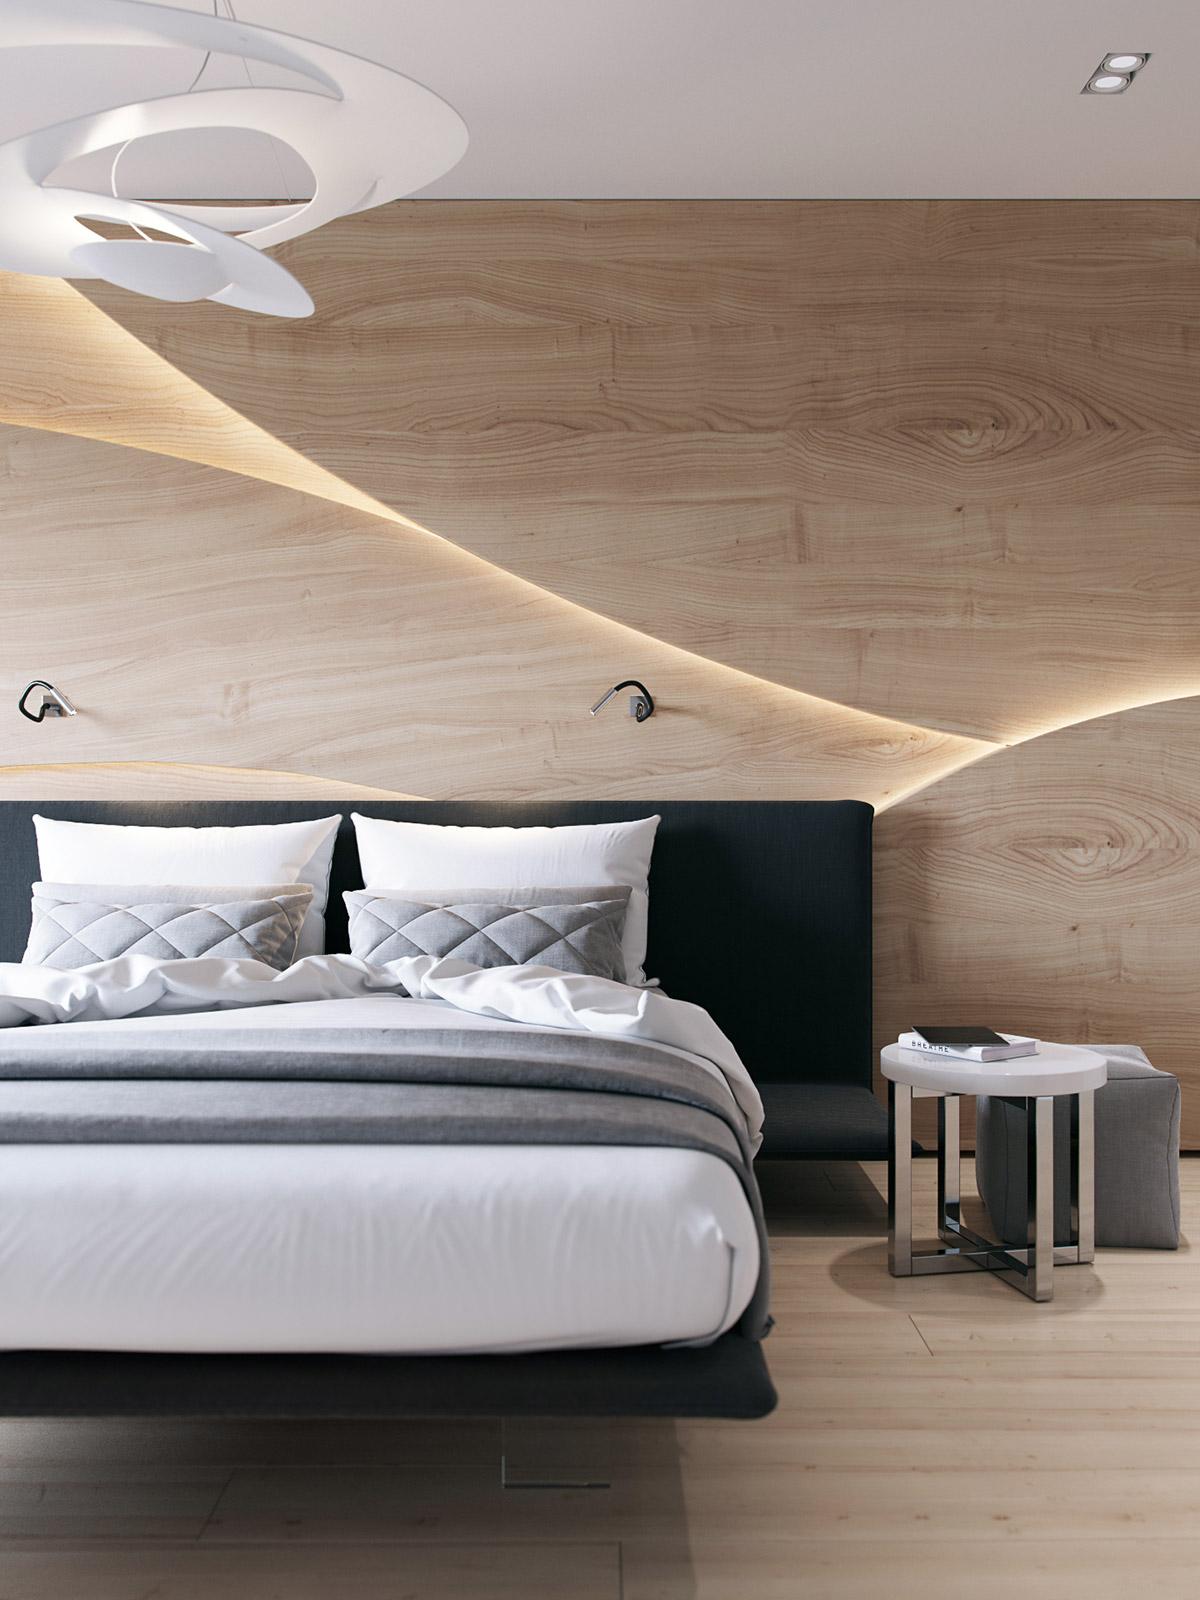 Home Bedroom Wall Design - HD Wallpaper